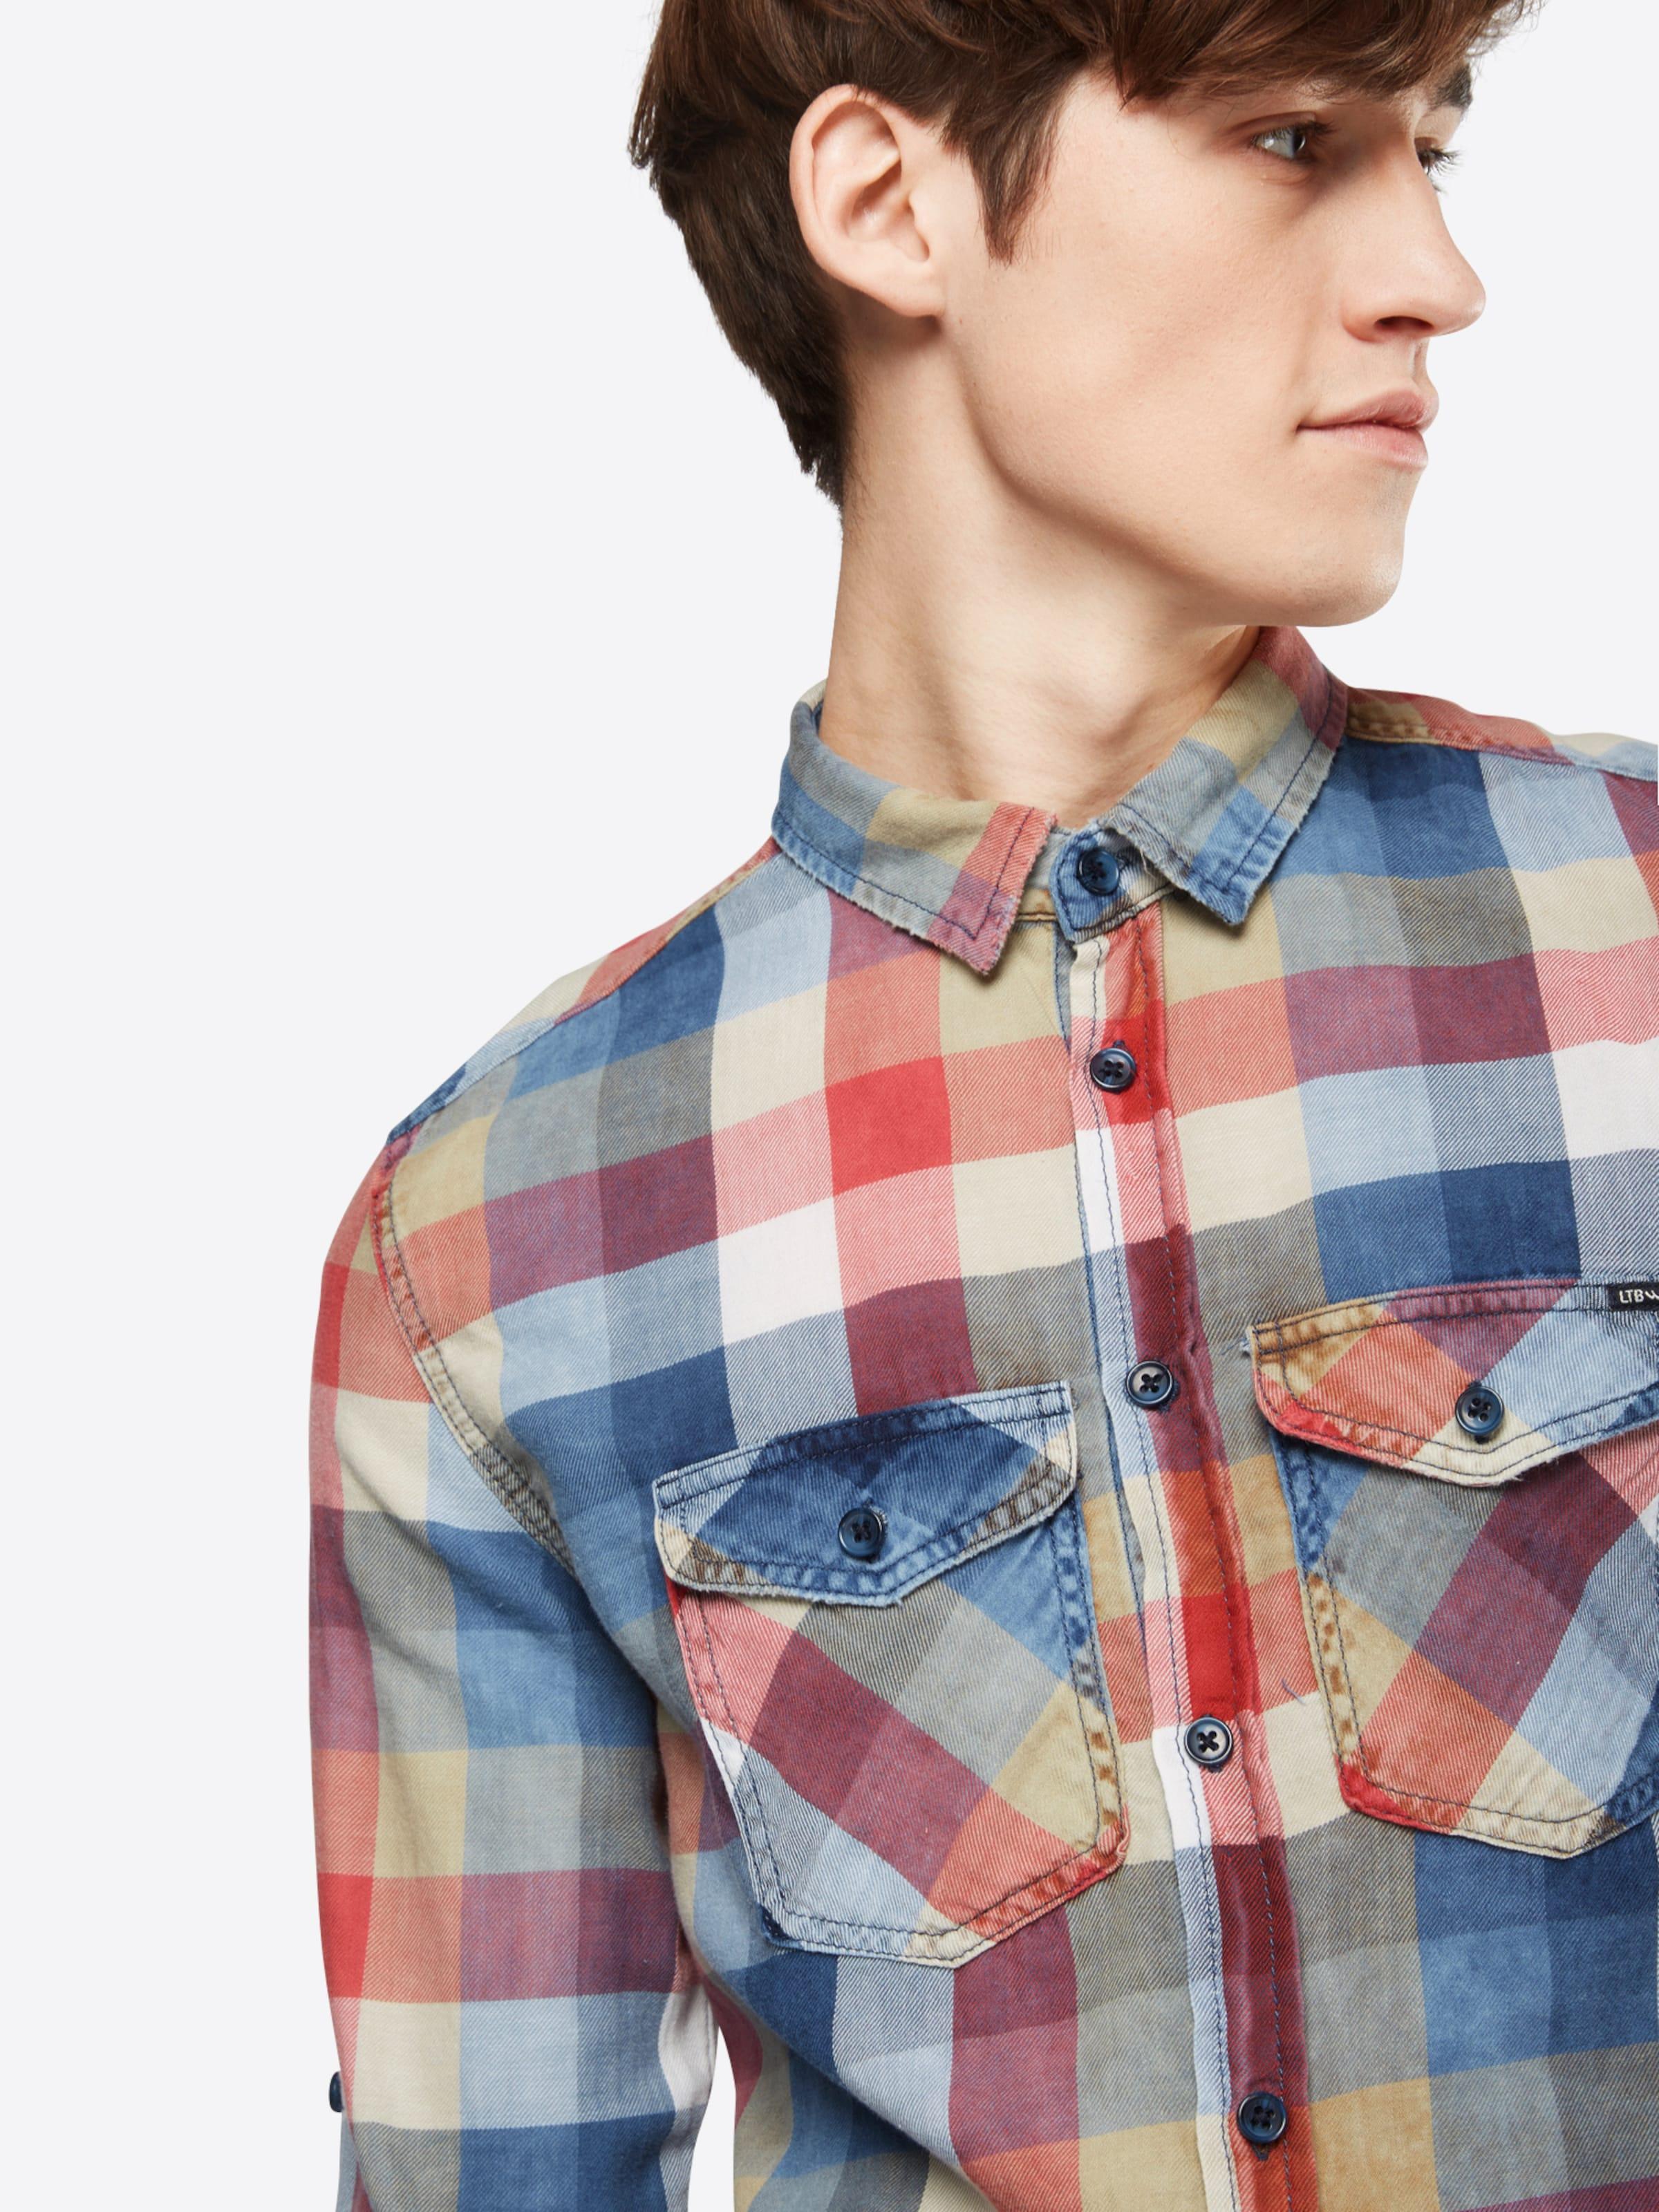 LTB Gemustertes Hemd 'RIAS' Auslass Ausgezeichnet Rabatt Billig Freies Verschiffen Online-Shopping Rabatt Niedriger Versand Rabatt Footlocker dVBsaBdMTE